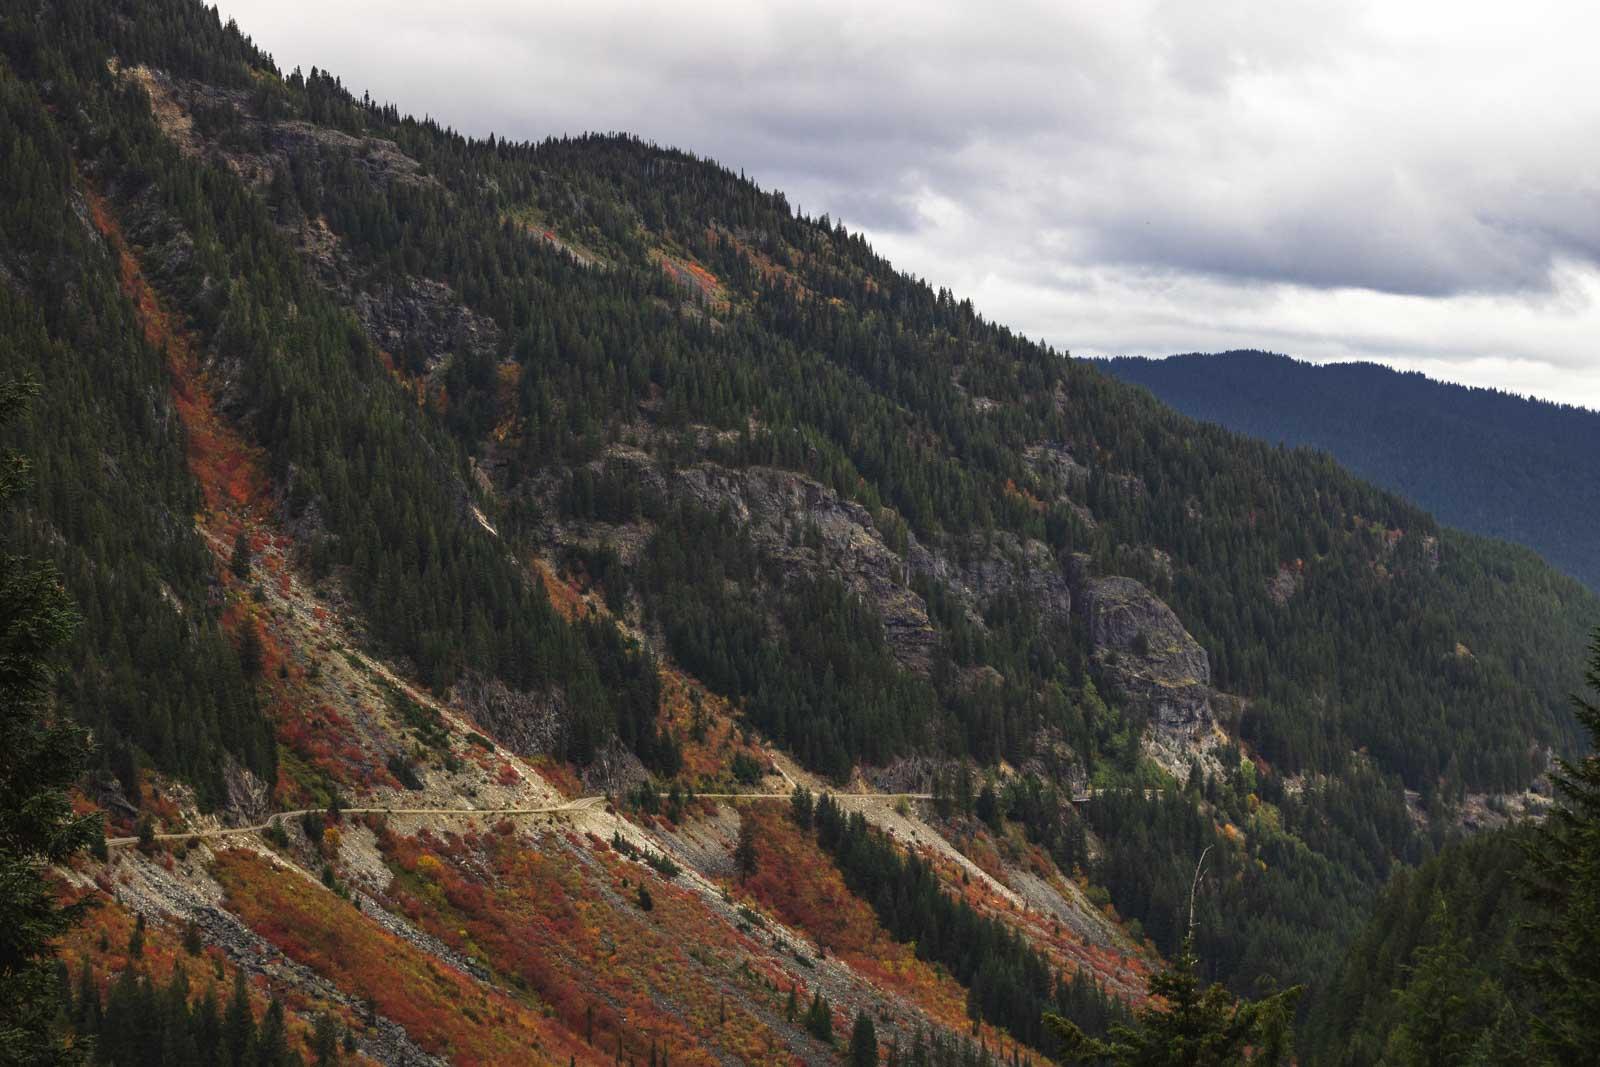 Mount Rainier for your Washington road trip.